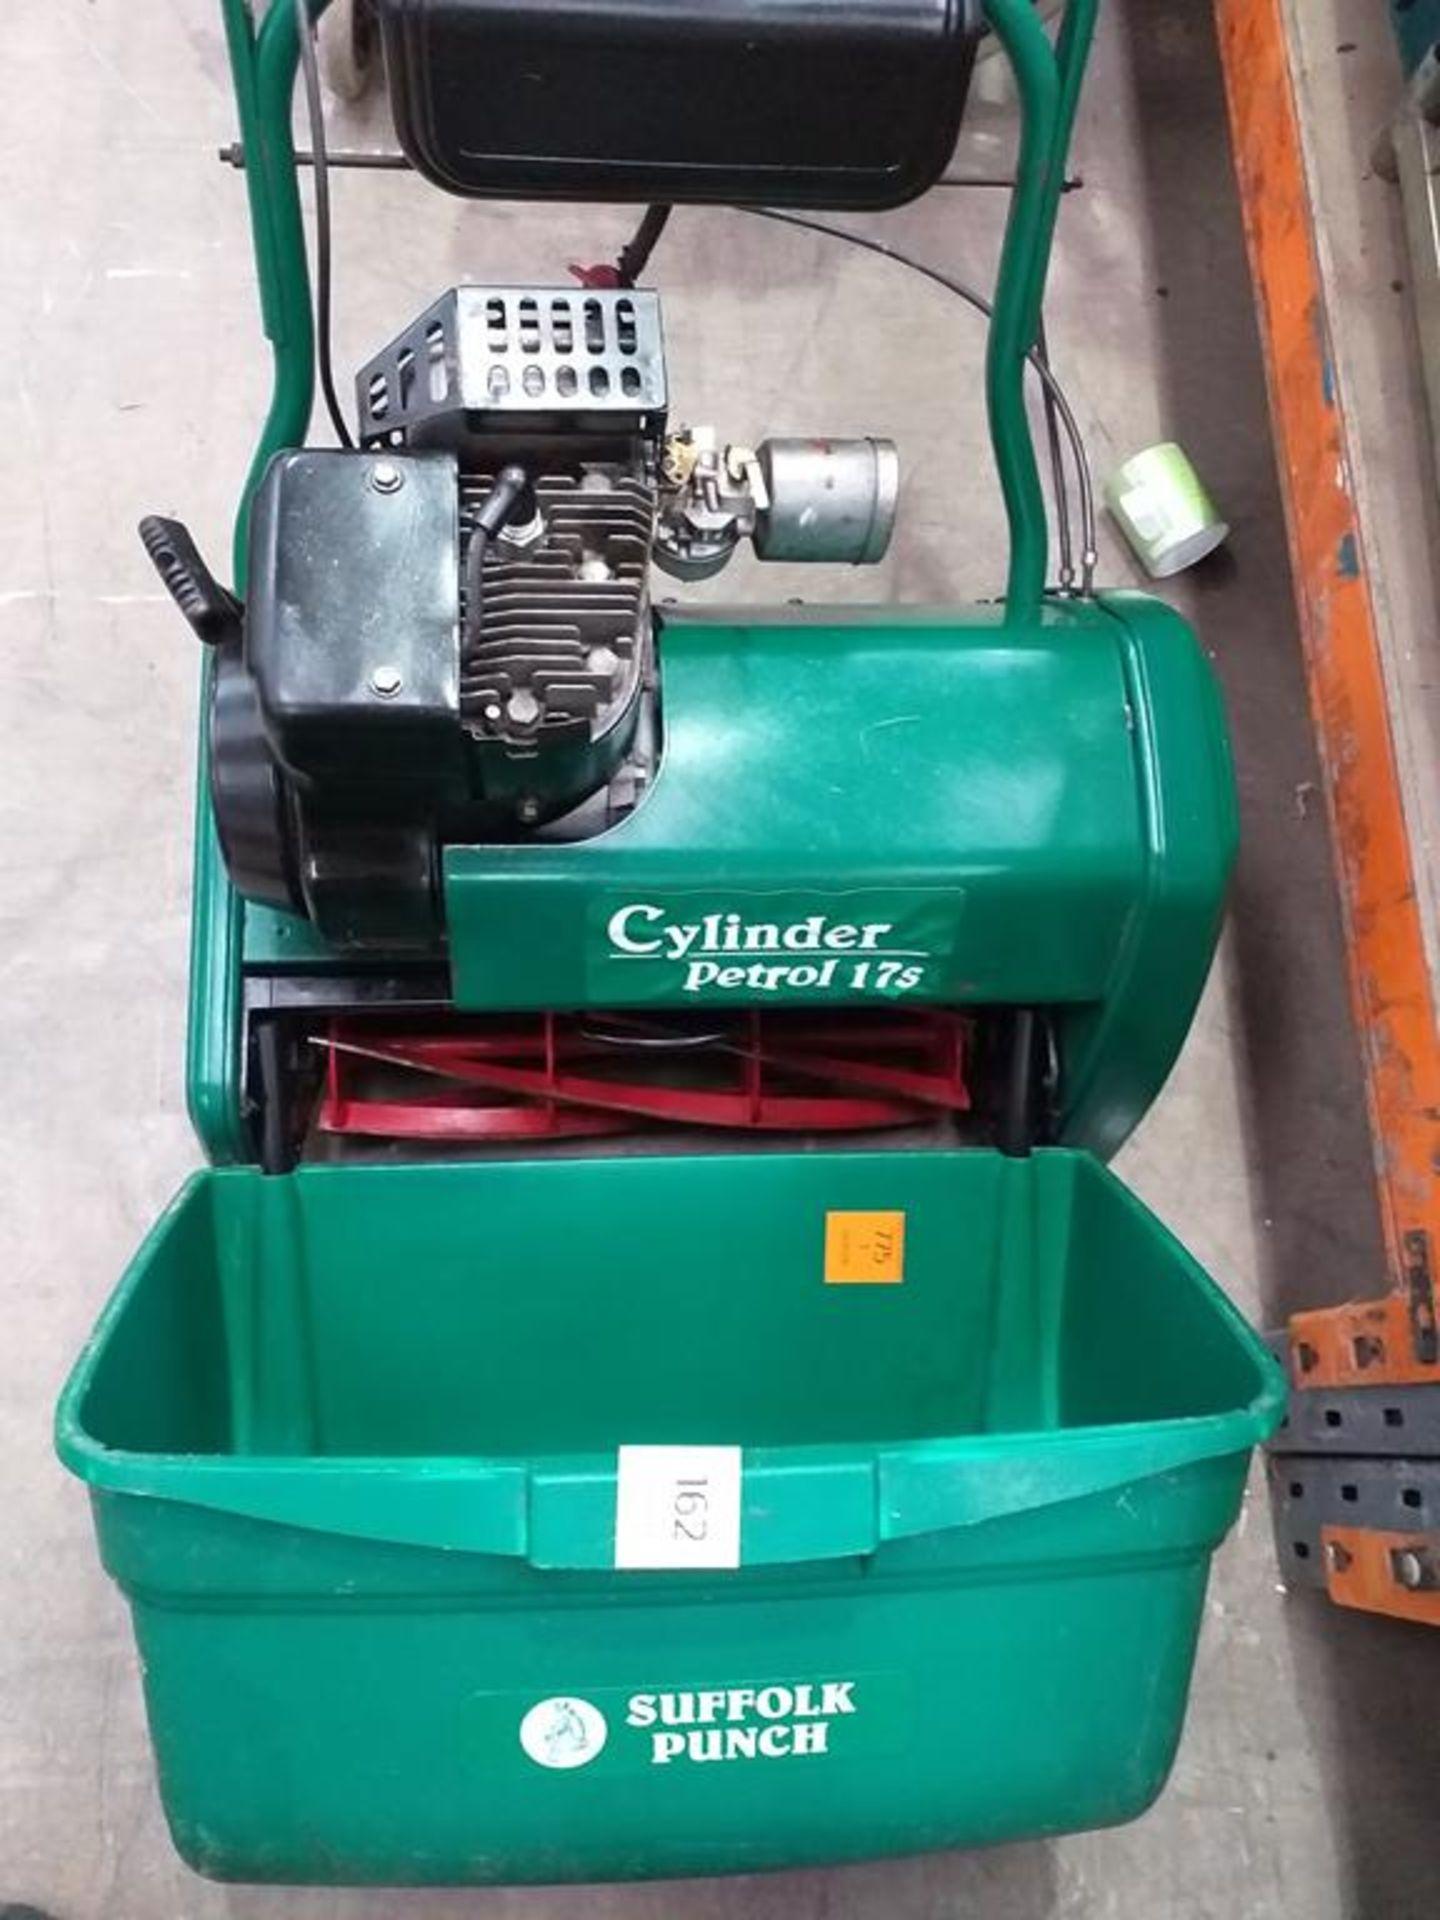 Lot 162 - A Suffolk Punch Cylinder Petrol Mower